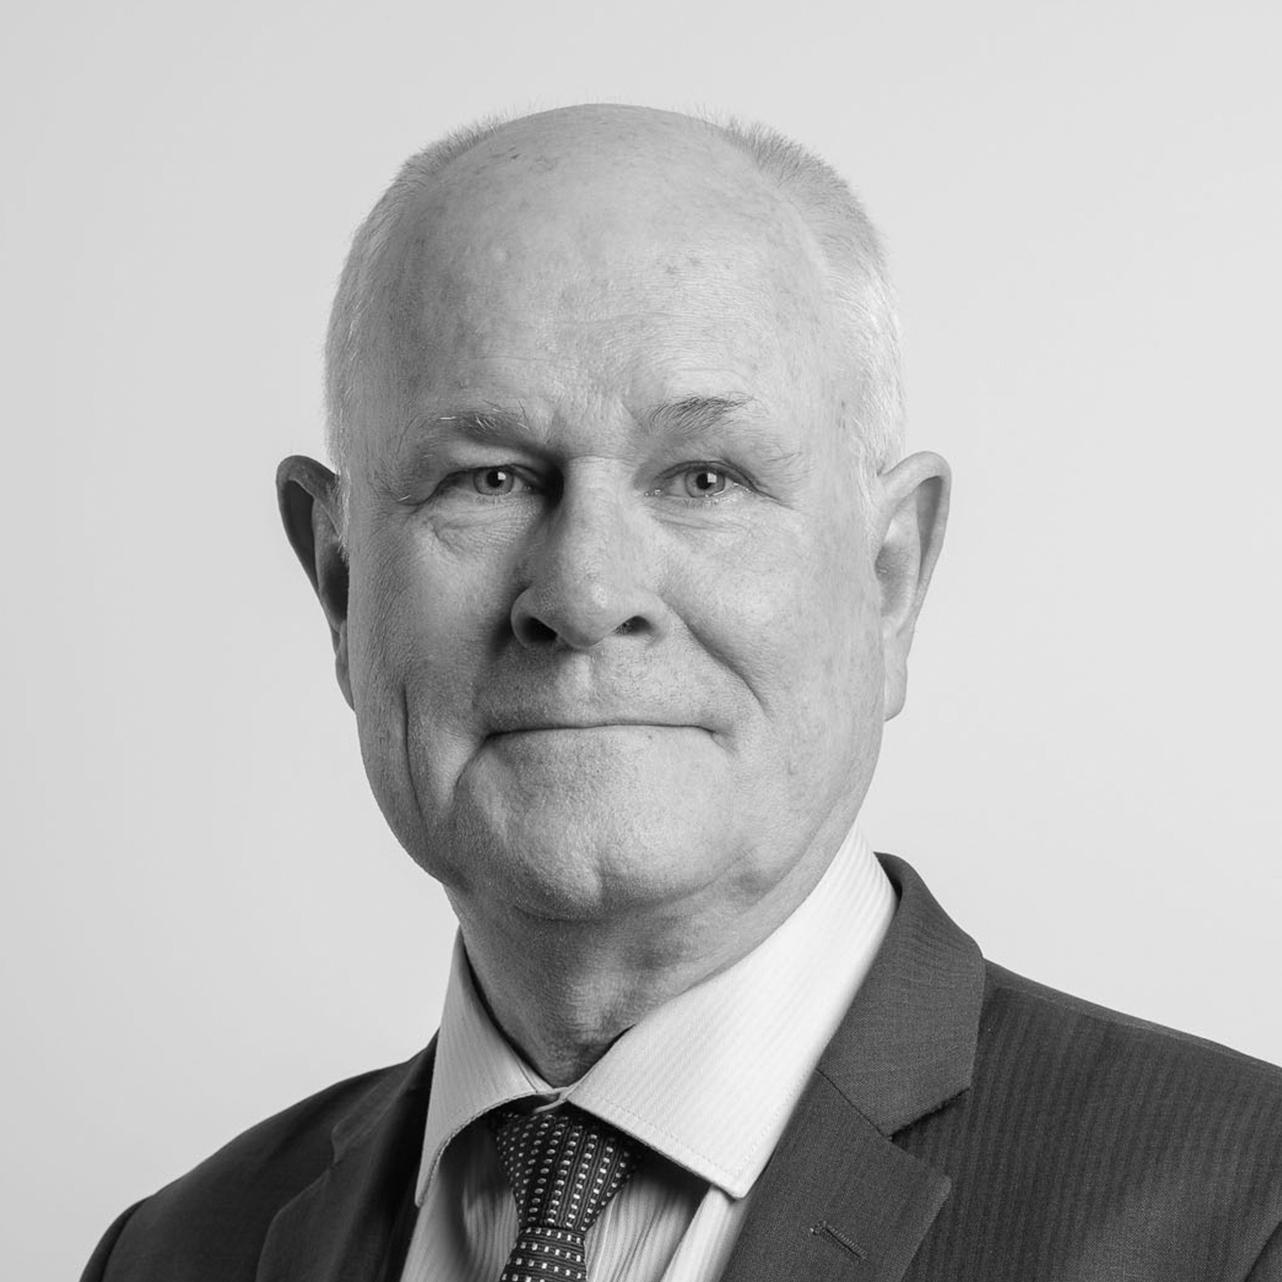 A photo of Mark McEnallay